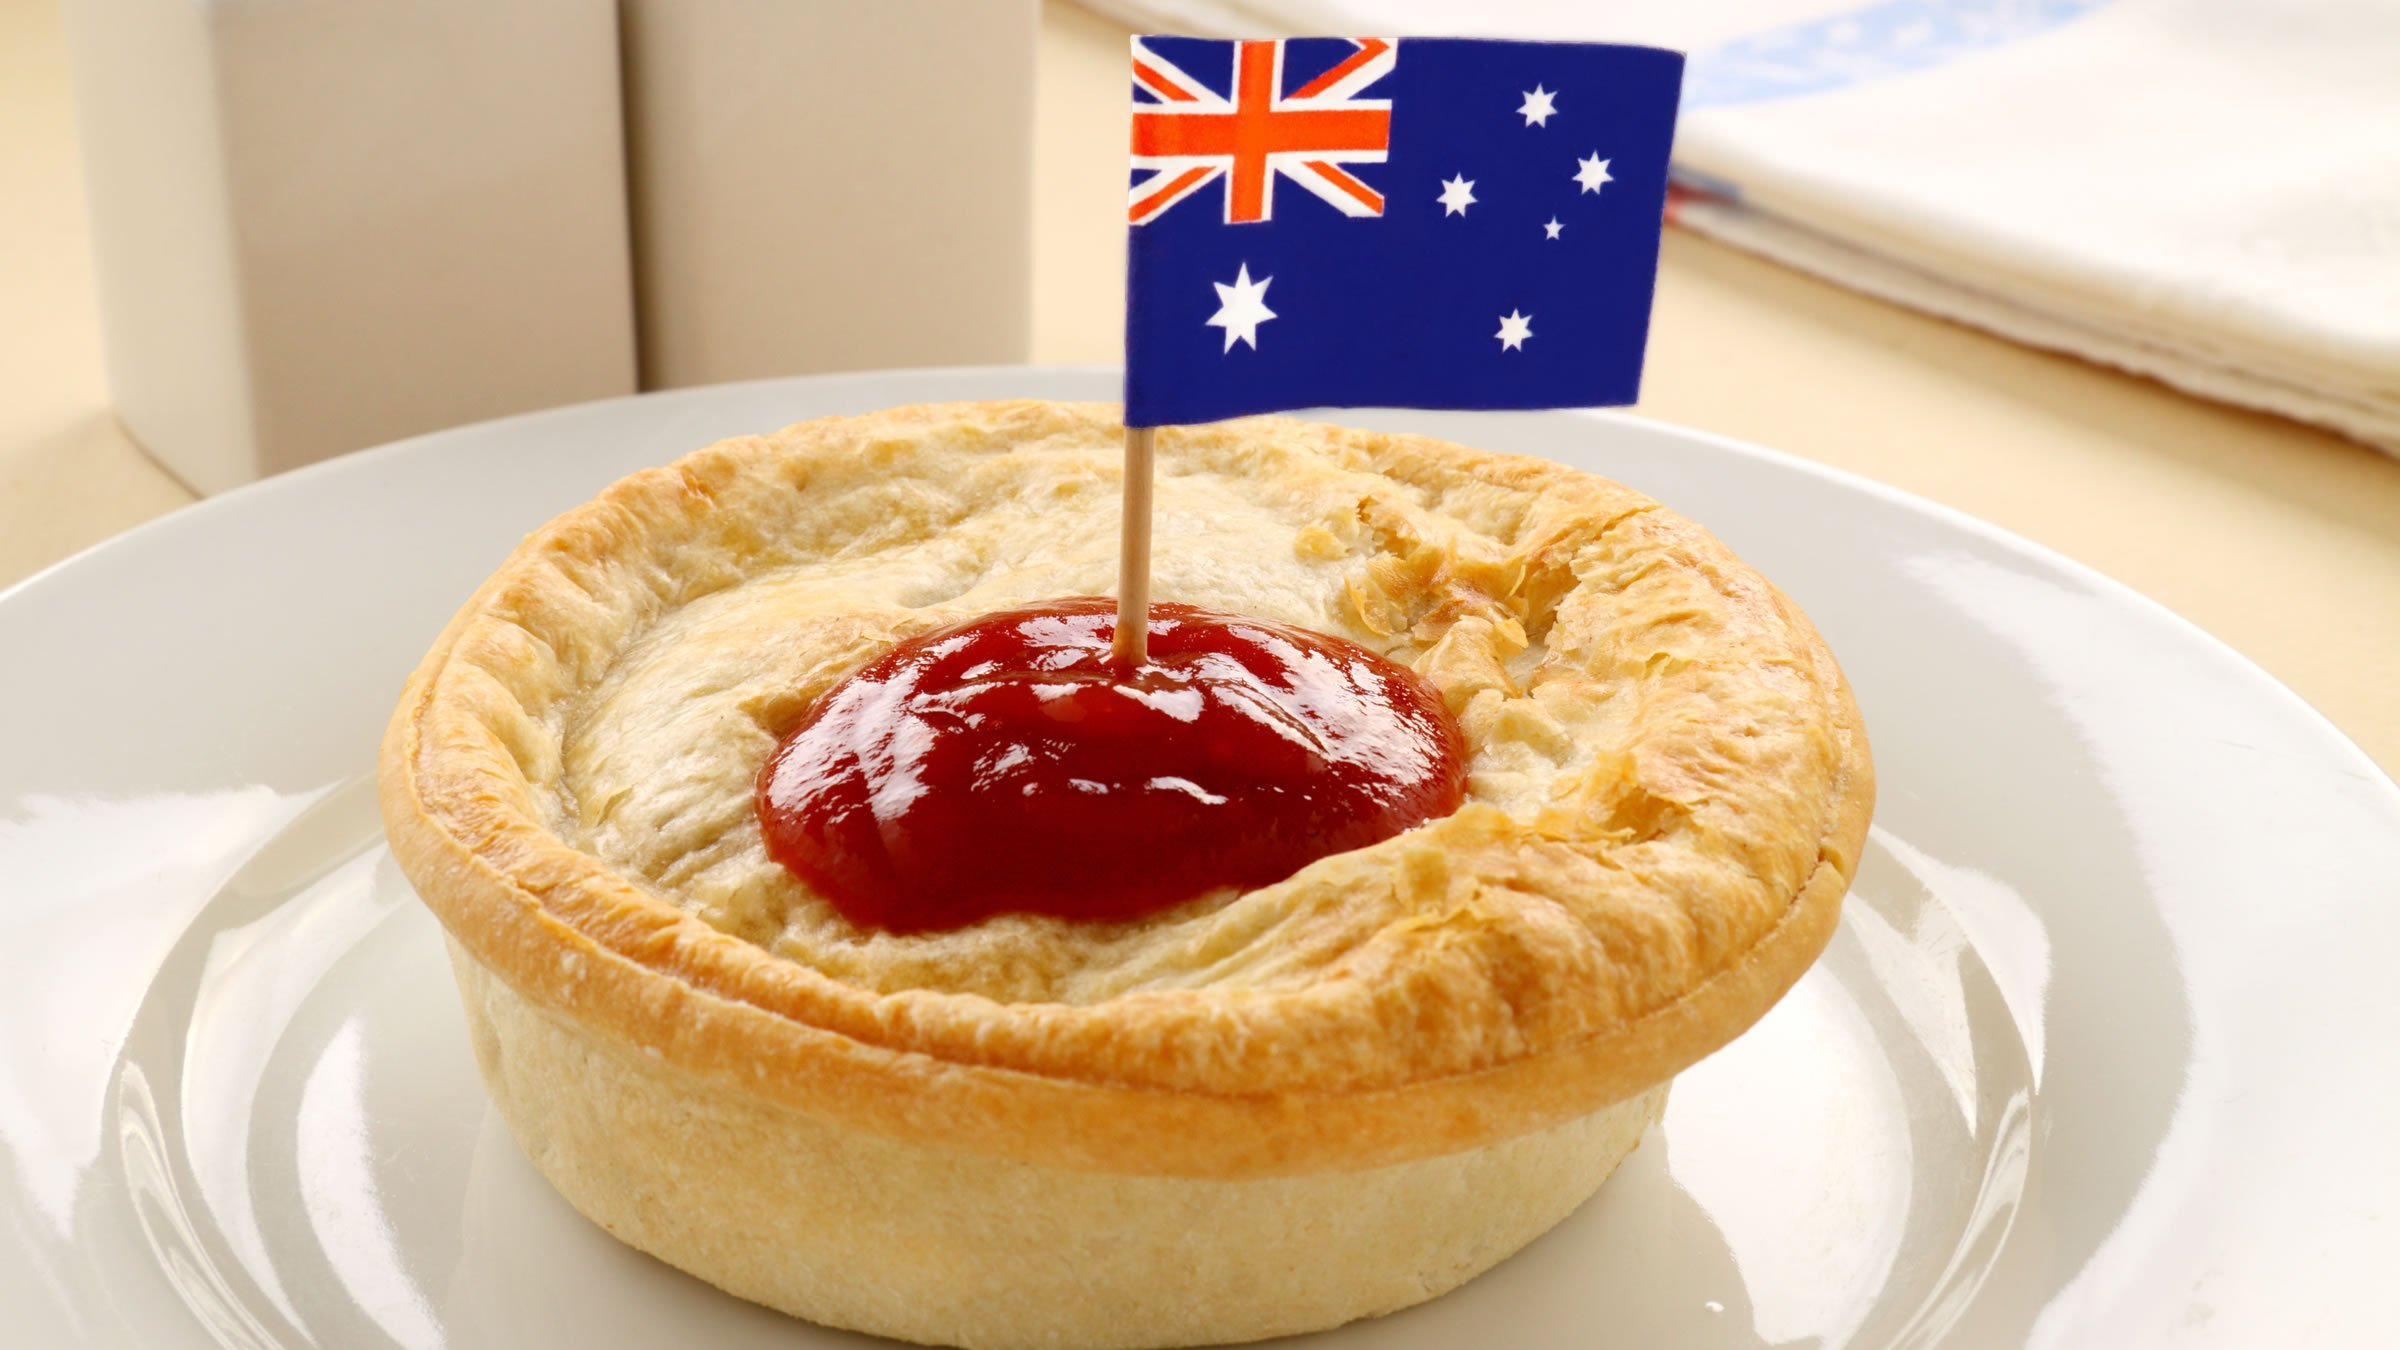 Pastel de carne picada australiano for Australian fusion cuisine